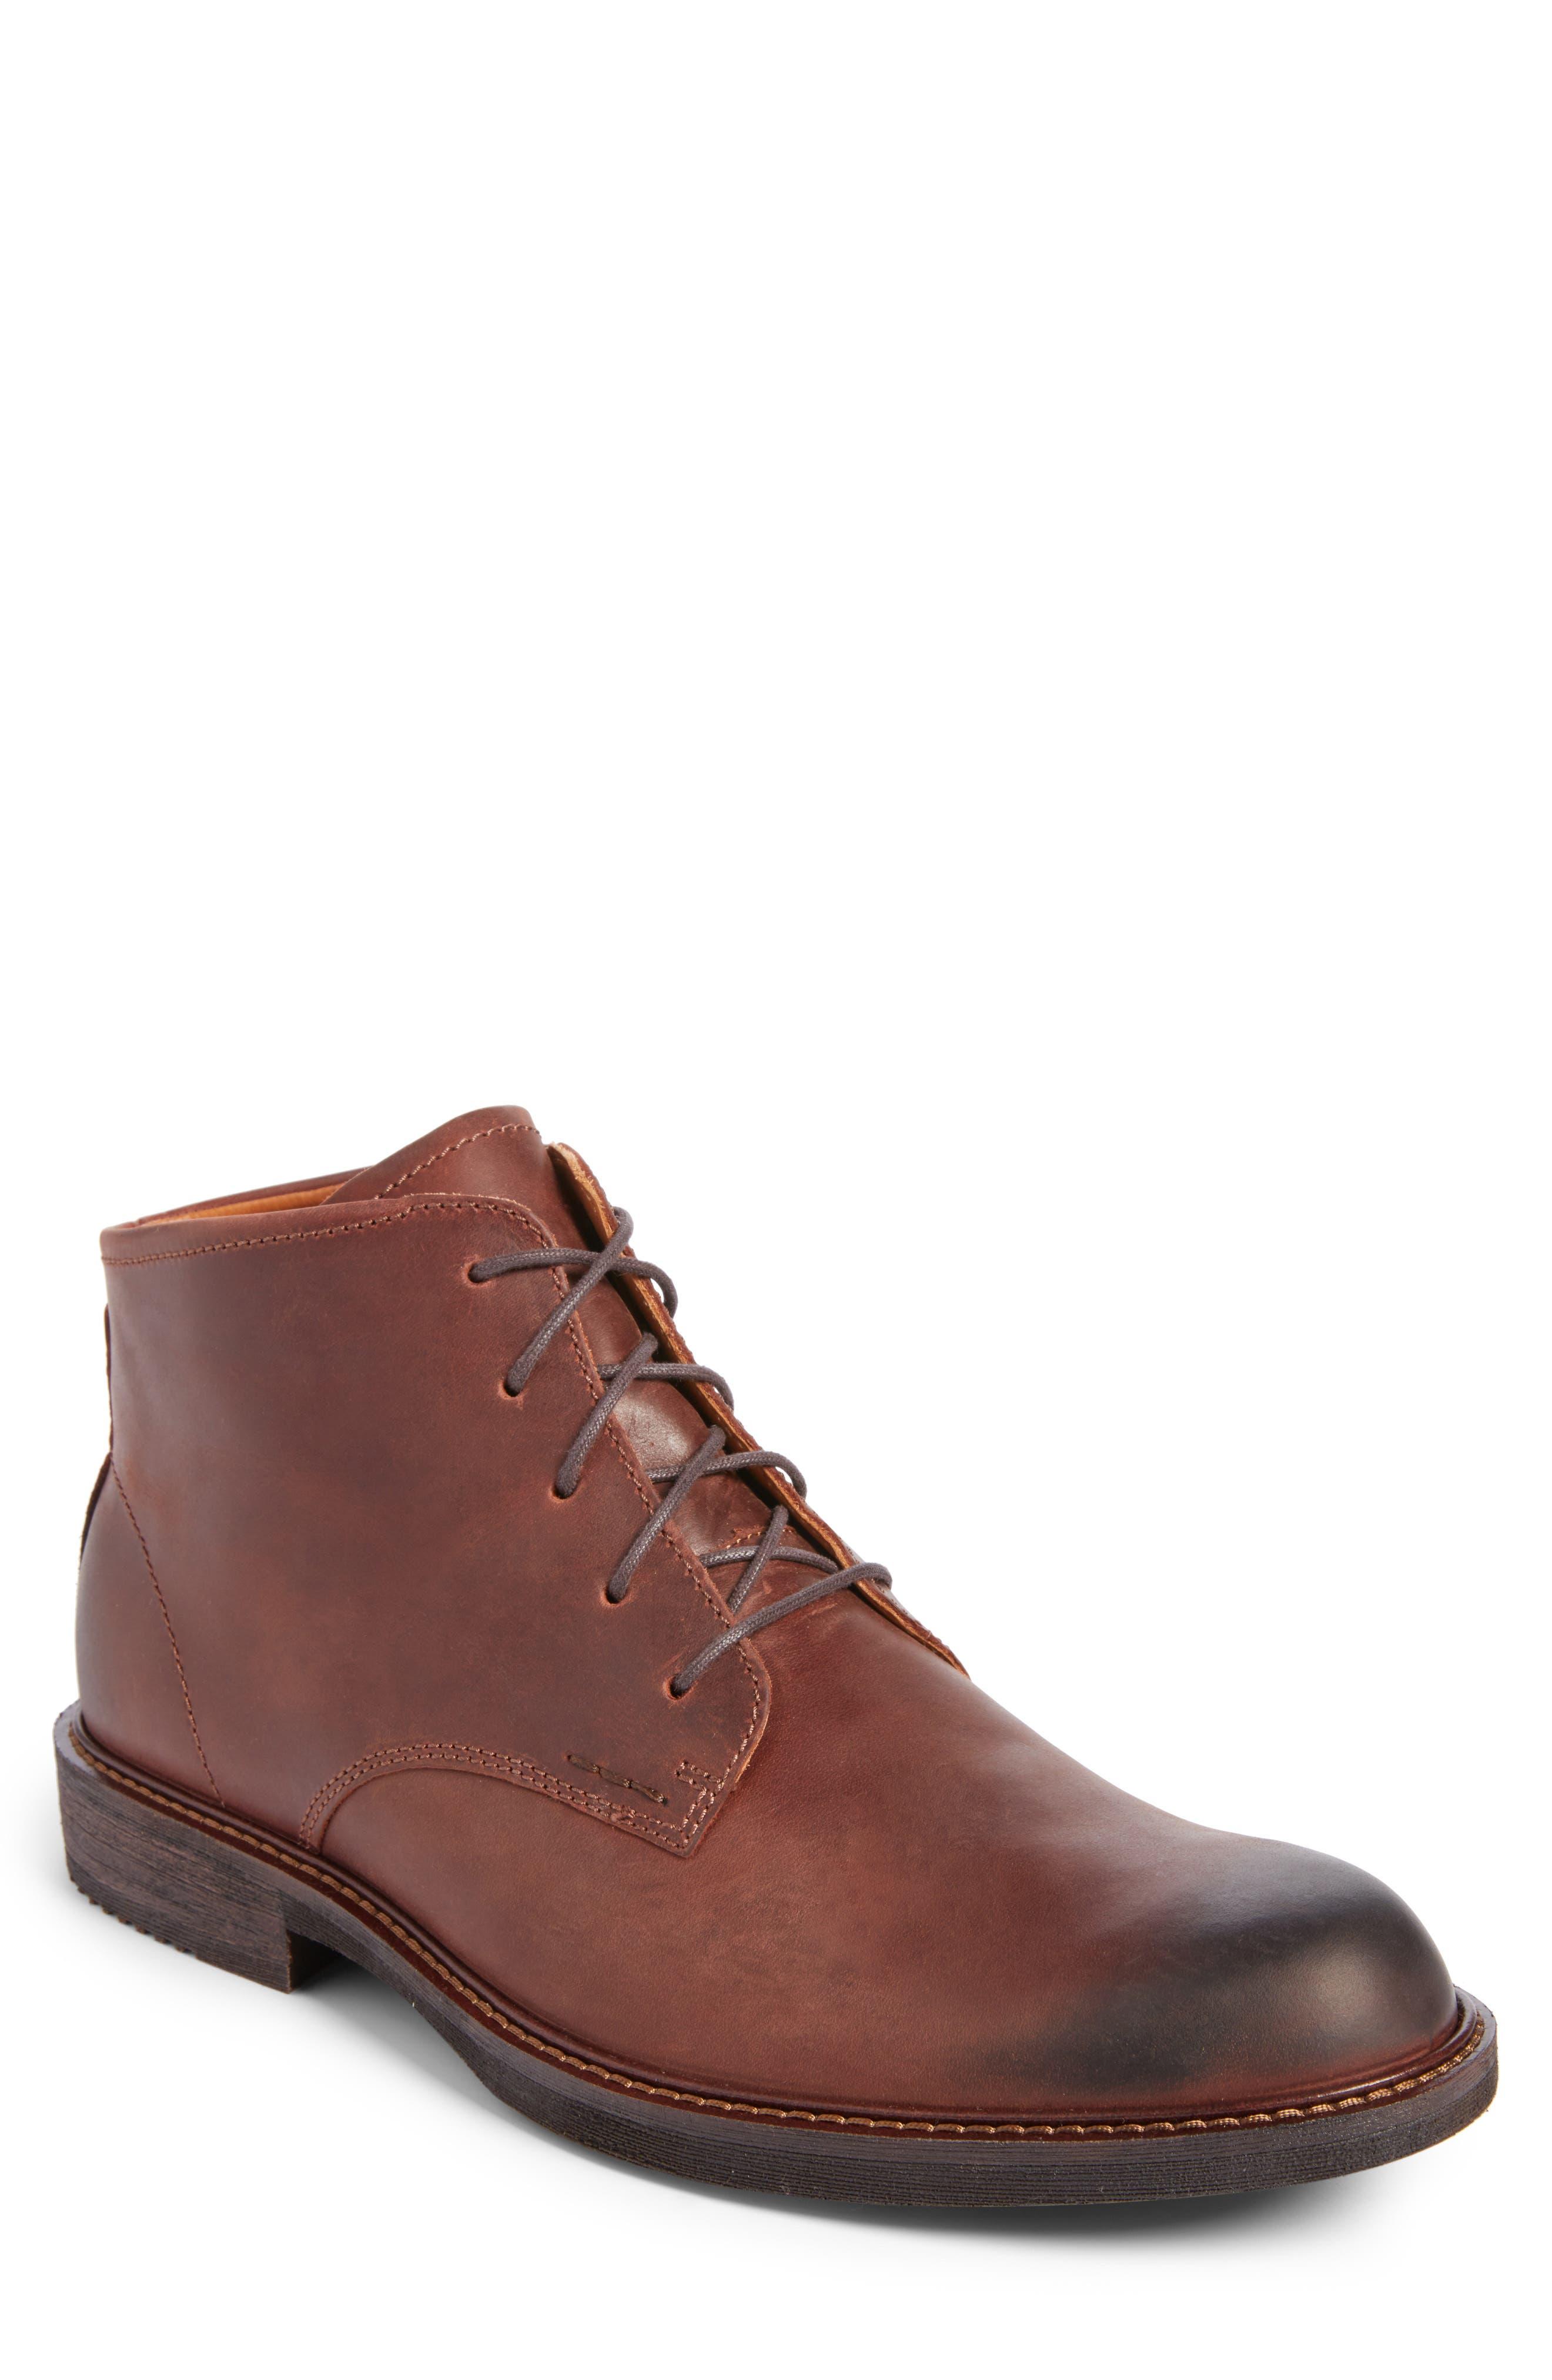 Main Image - ECCO 'Kenton' Plain Toe Boot (Men)